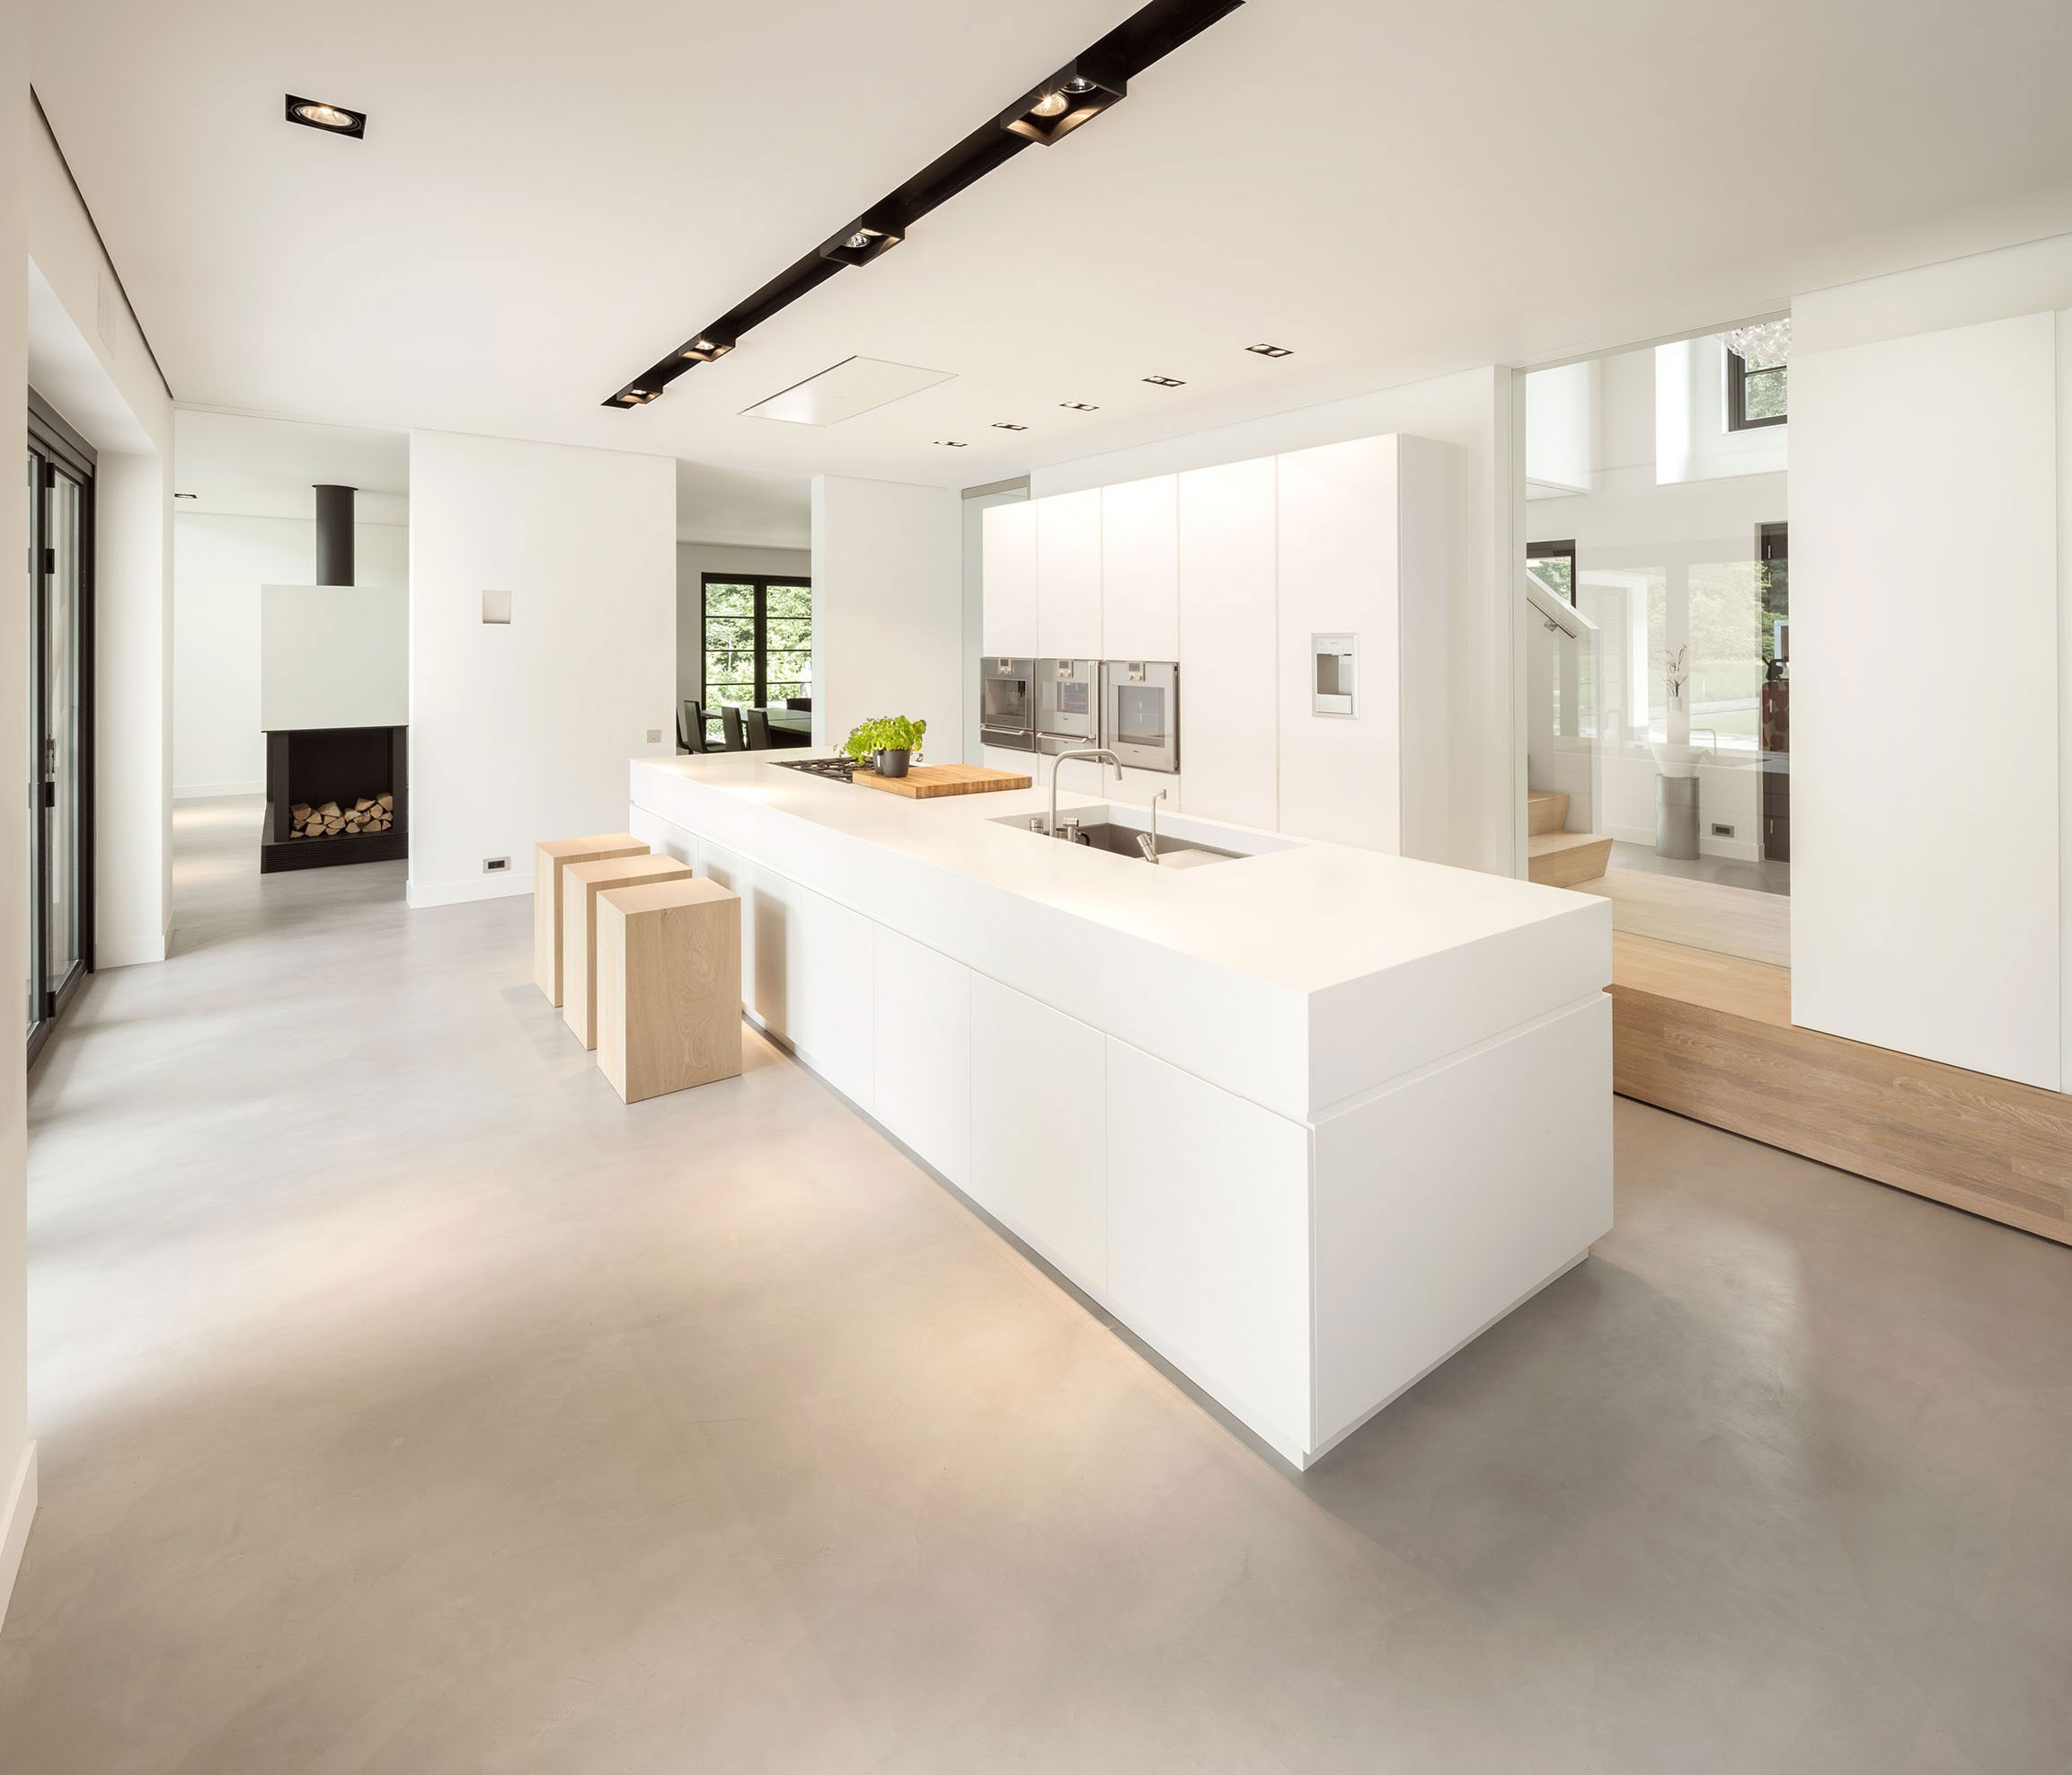 Modern Huizen Country House Located in a Quiet Rural Setting by De Brouwer Binnenwerk-09